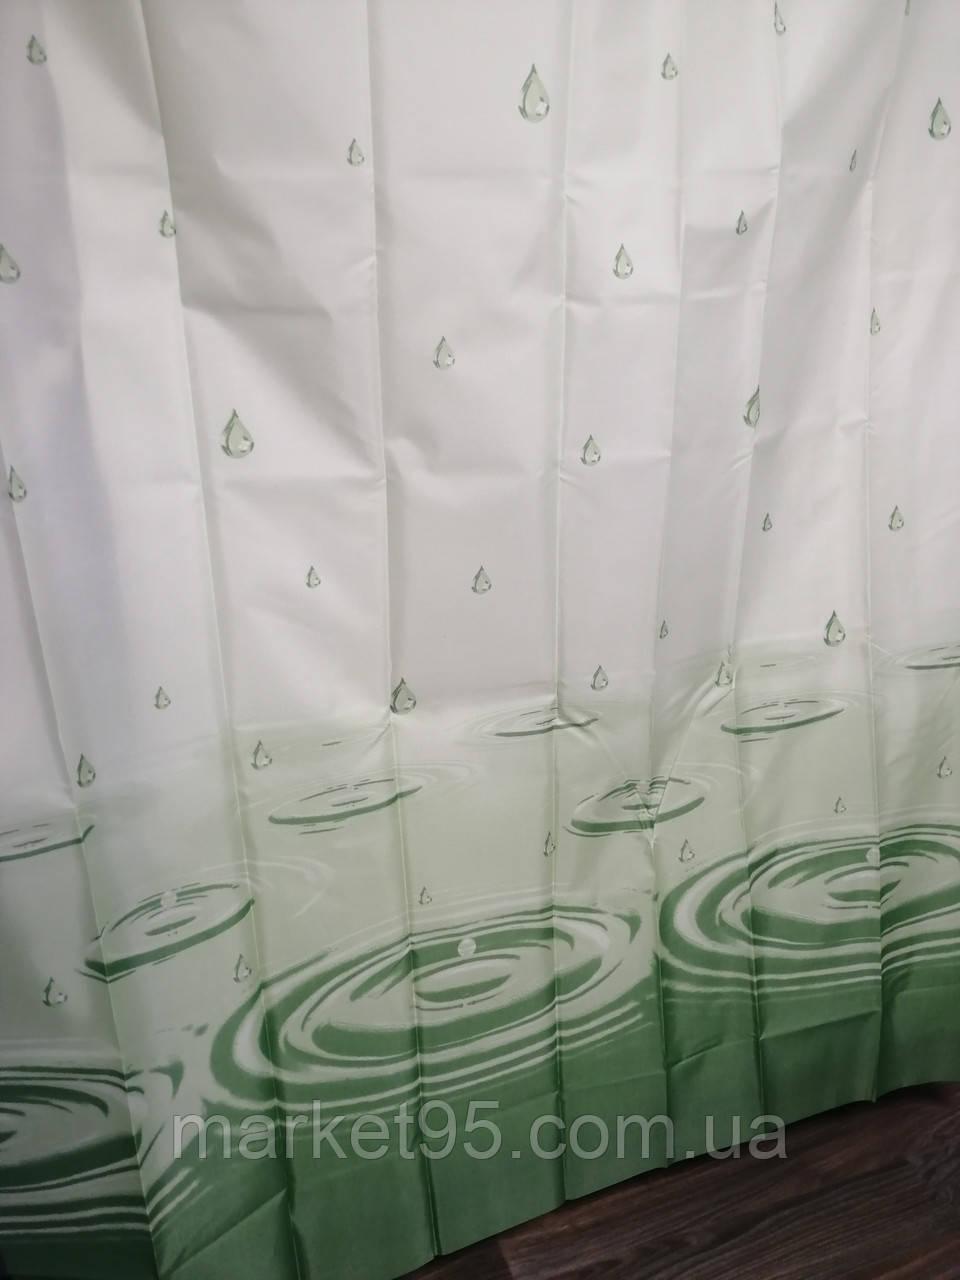 Штора для ванной душа тканевая 180х200см